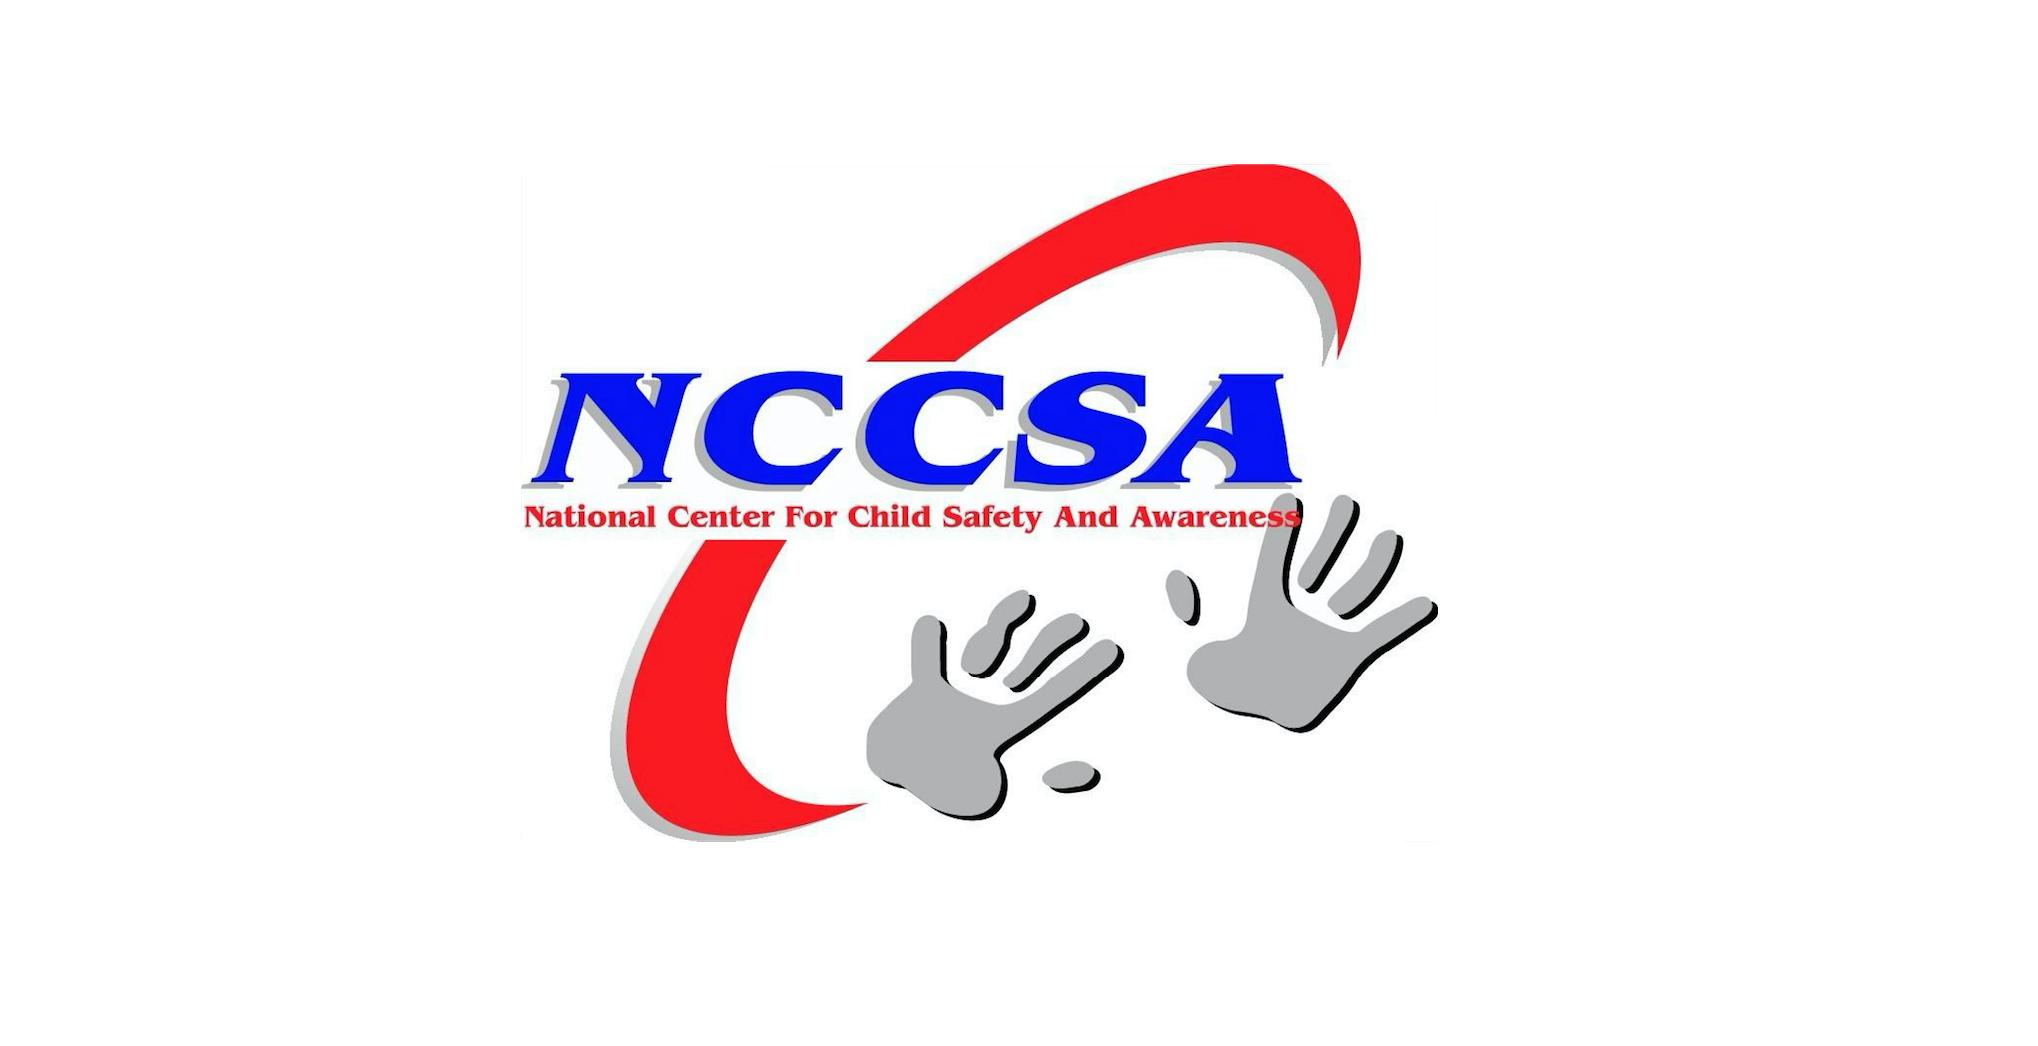 NCCSA.png